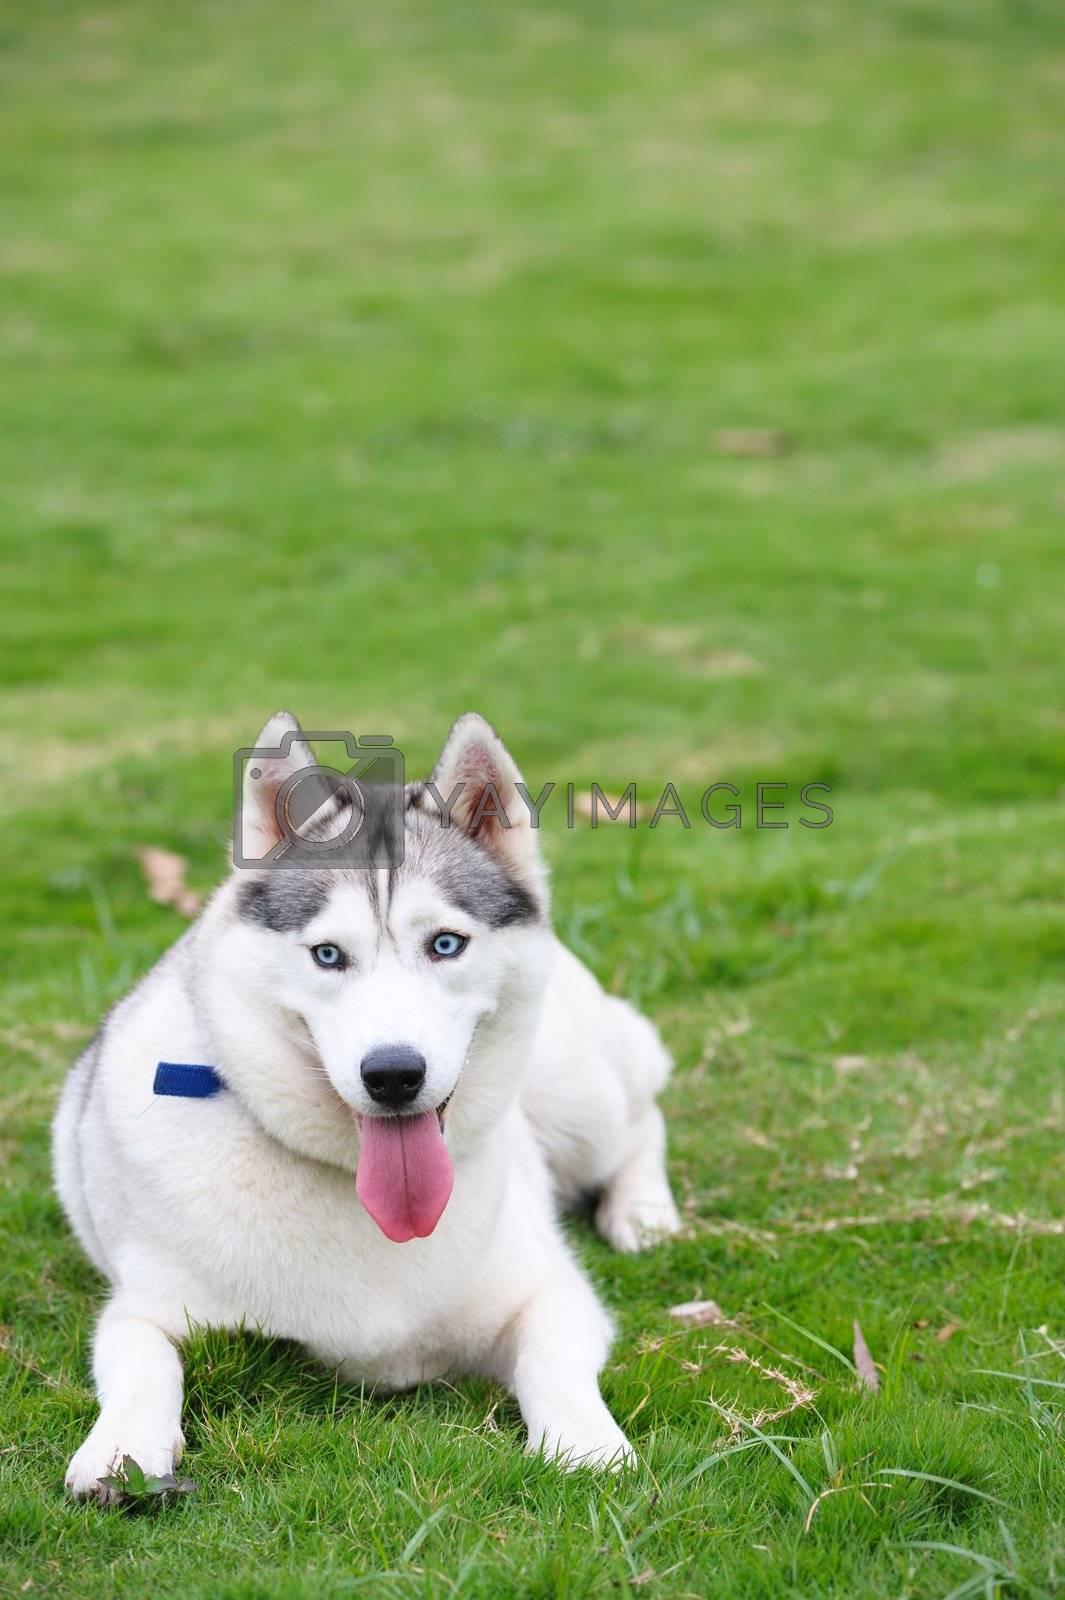 Alaskan Malamute dog lying on the lawn